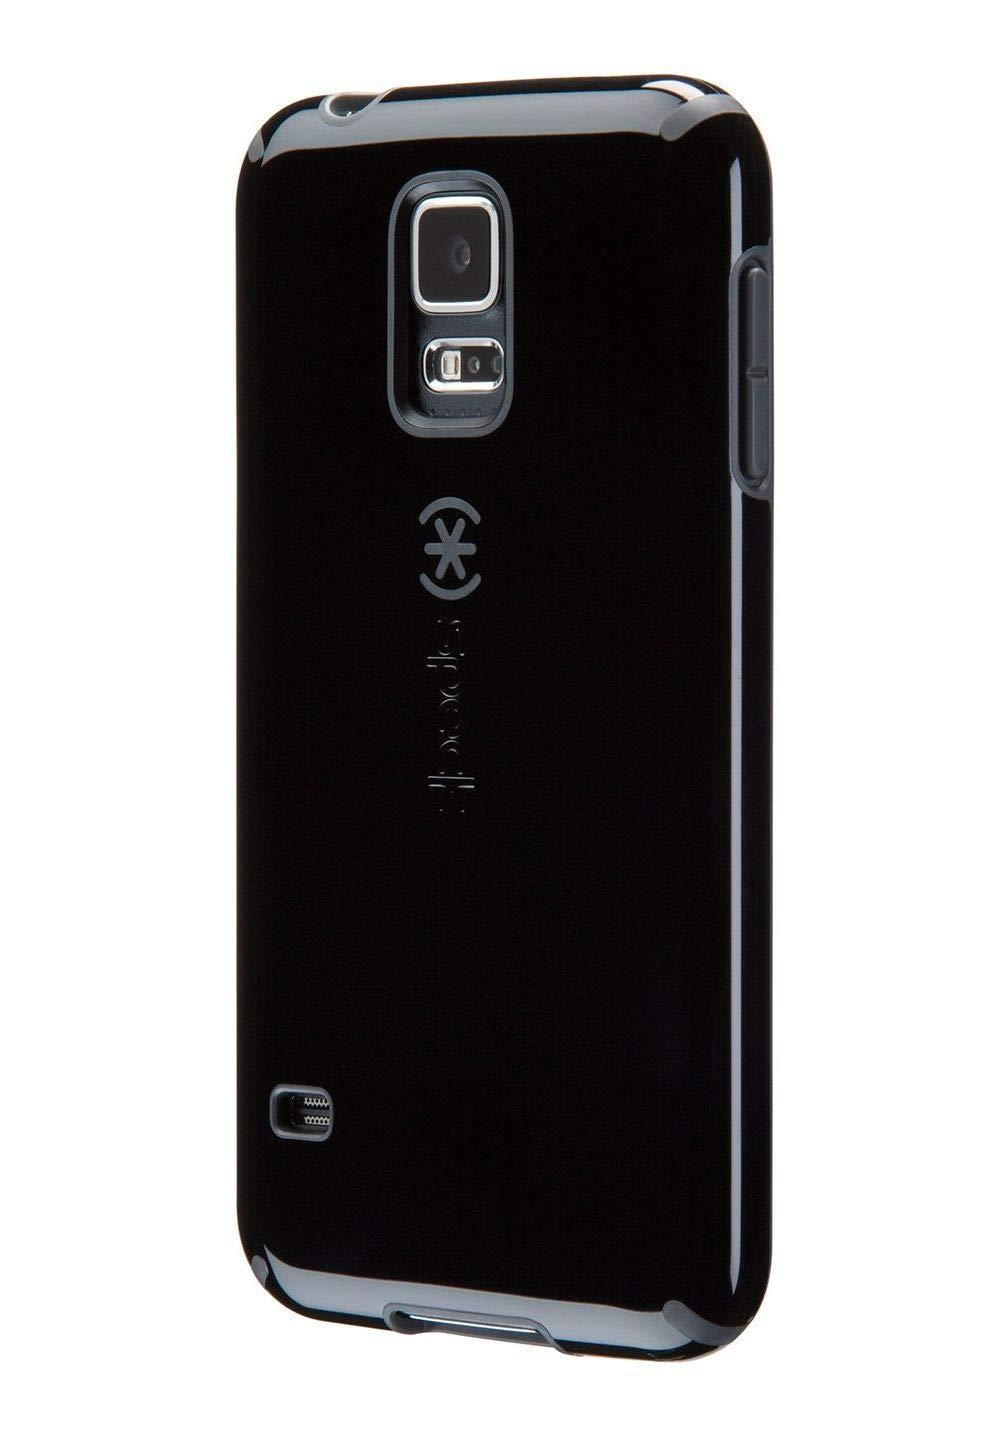 the best attitude 3866b 0fef5 Speck Candyshell Samsung Galaxy S5 Case Black / Dark Grey